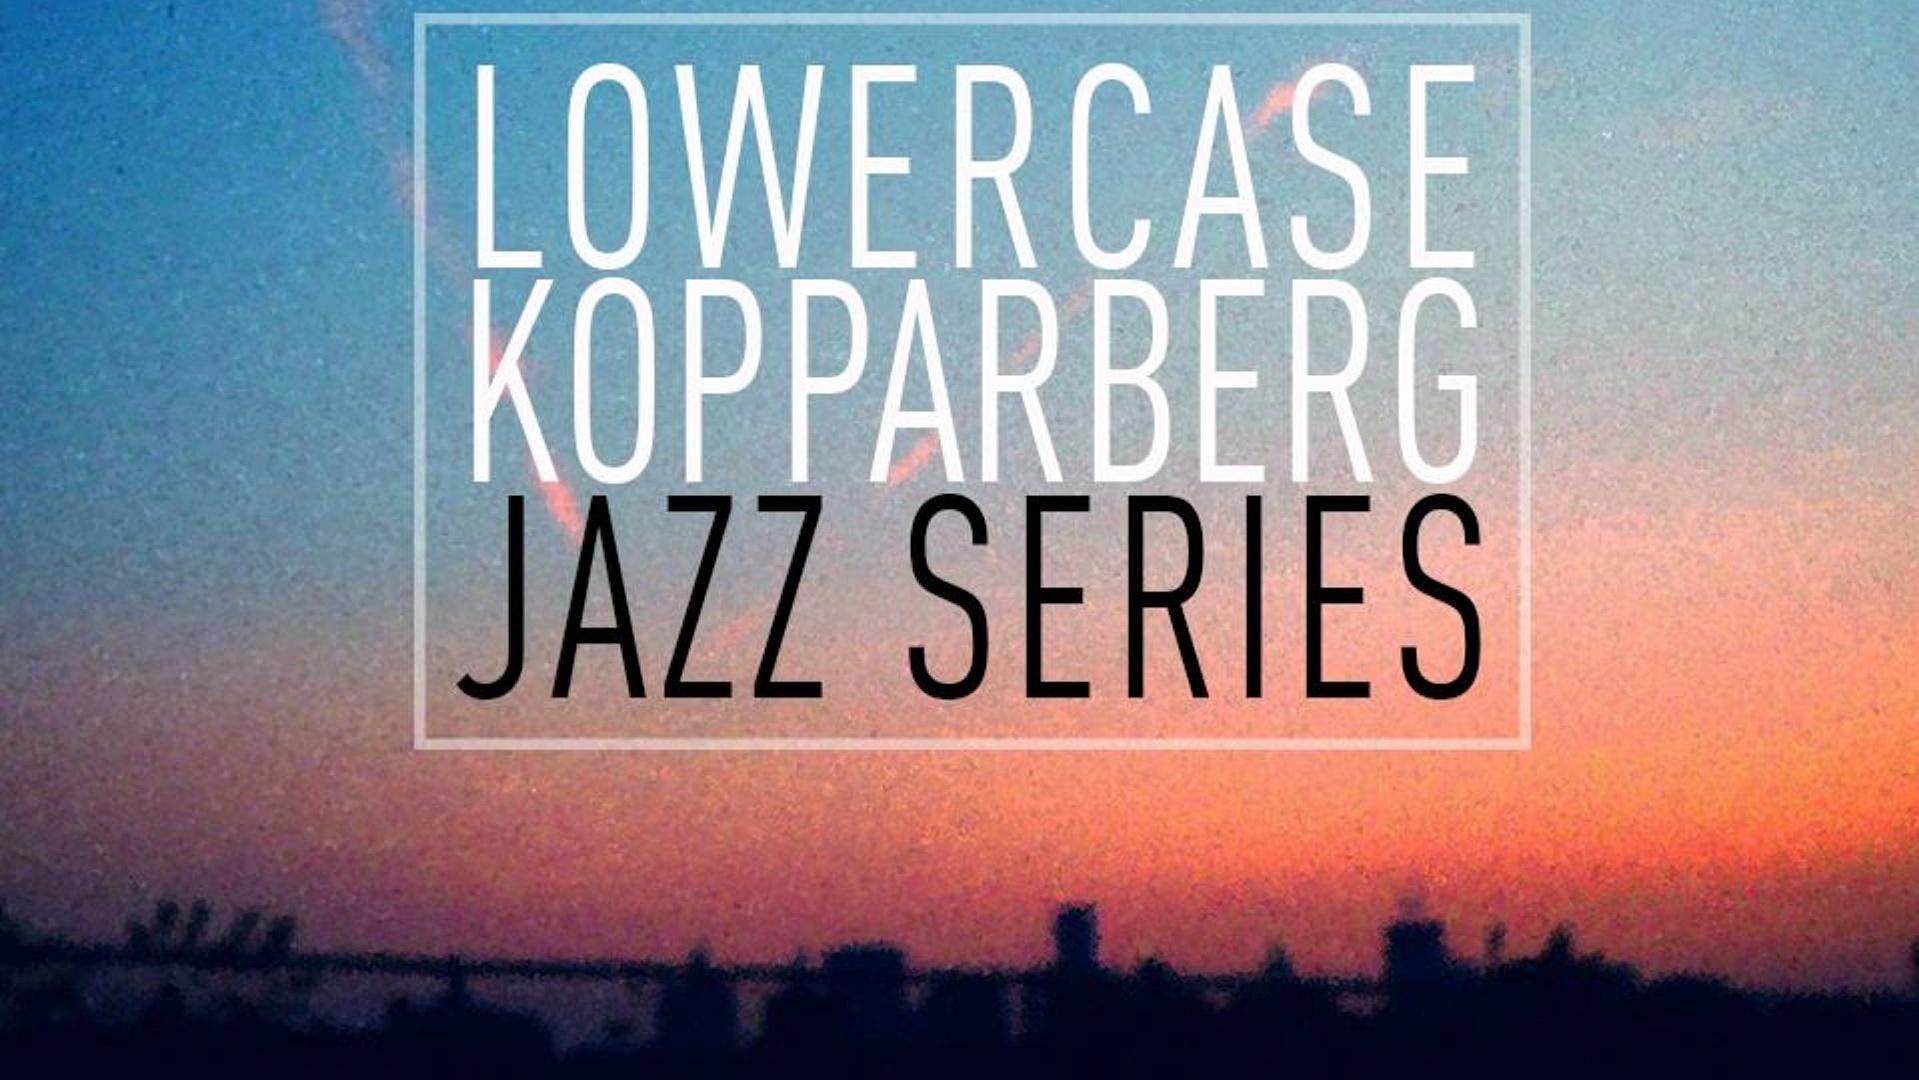 Lowercase Koppaberg Jazz Series #2